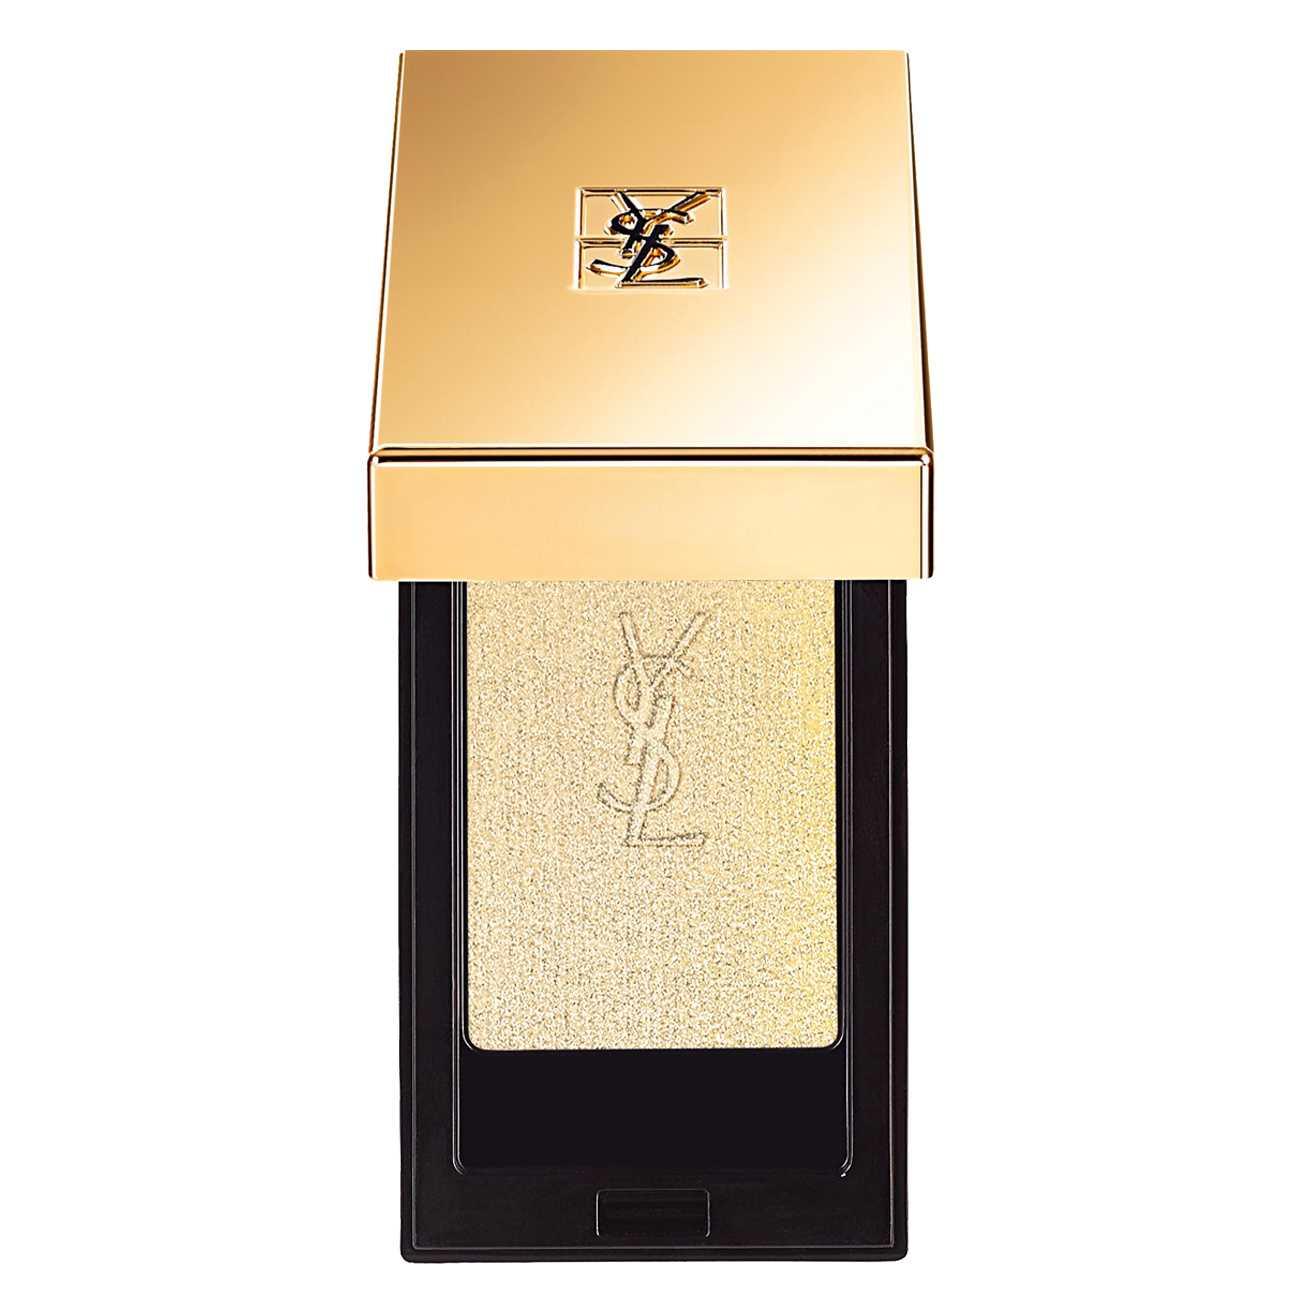 Couture Mono 1.5 G Fastes 12 Yves Saint Laurent imagine 2021 bestvalue.eu